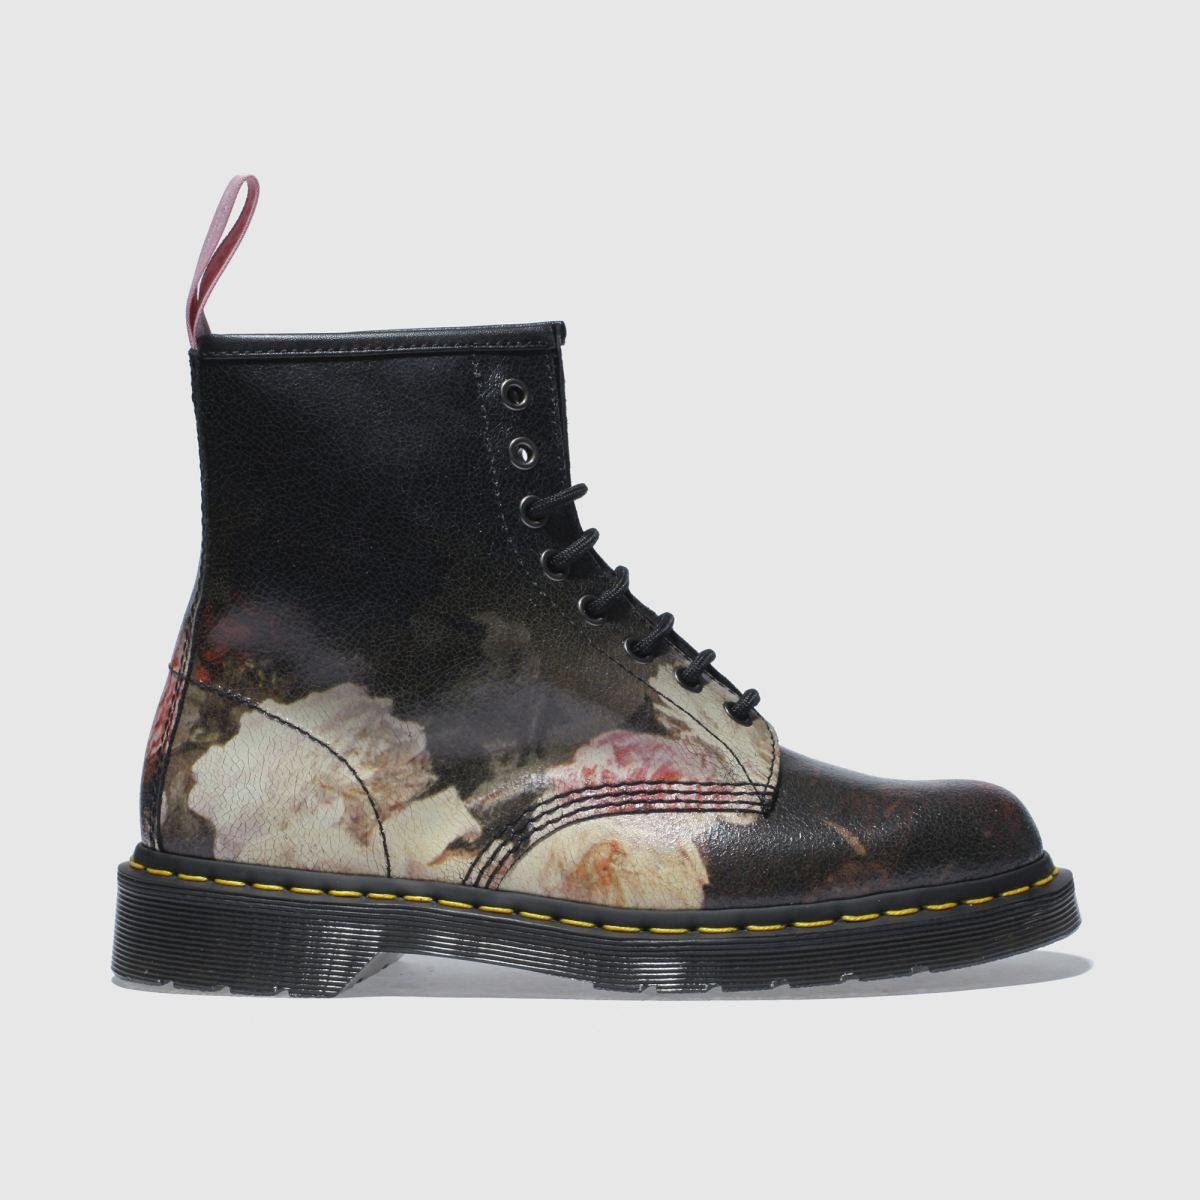 Dr Martens Black & Pink 1460 Power Corruption & Lies Boots